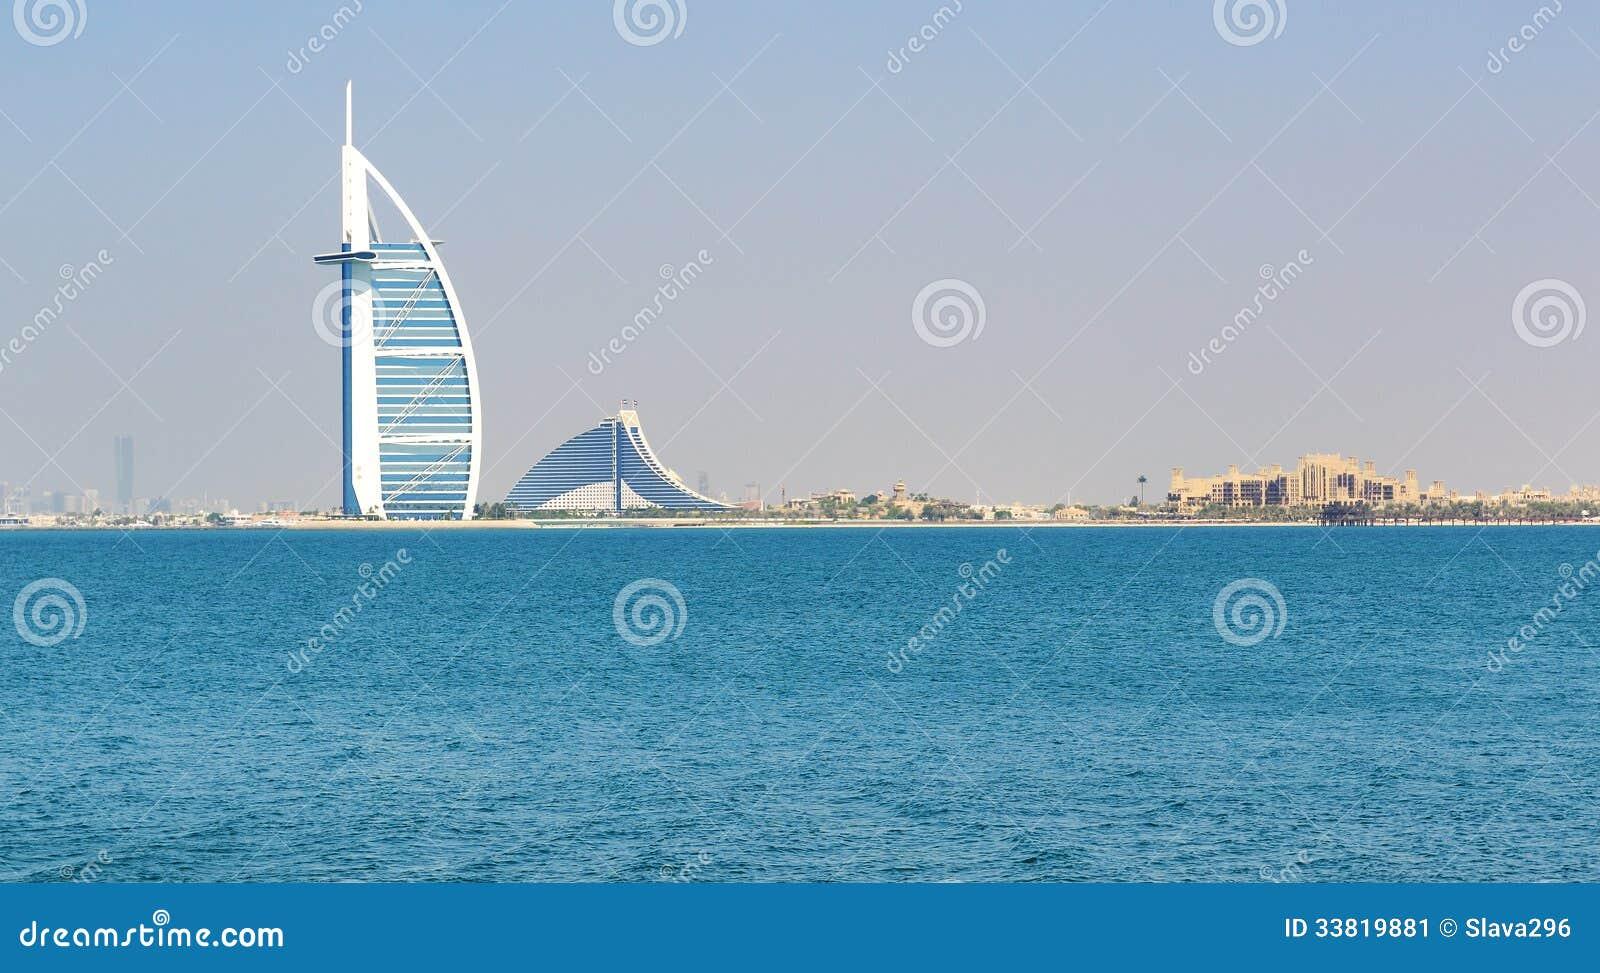 The view on burj al arab hotel editorial photo image for Sail hotel dubai